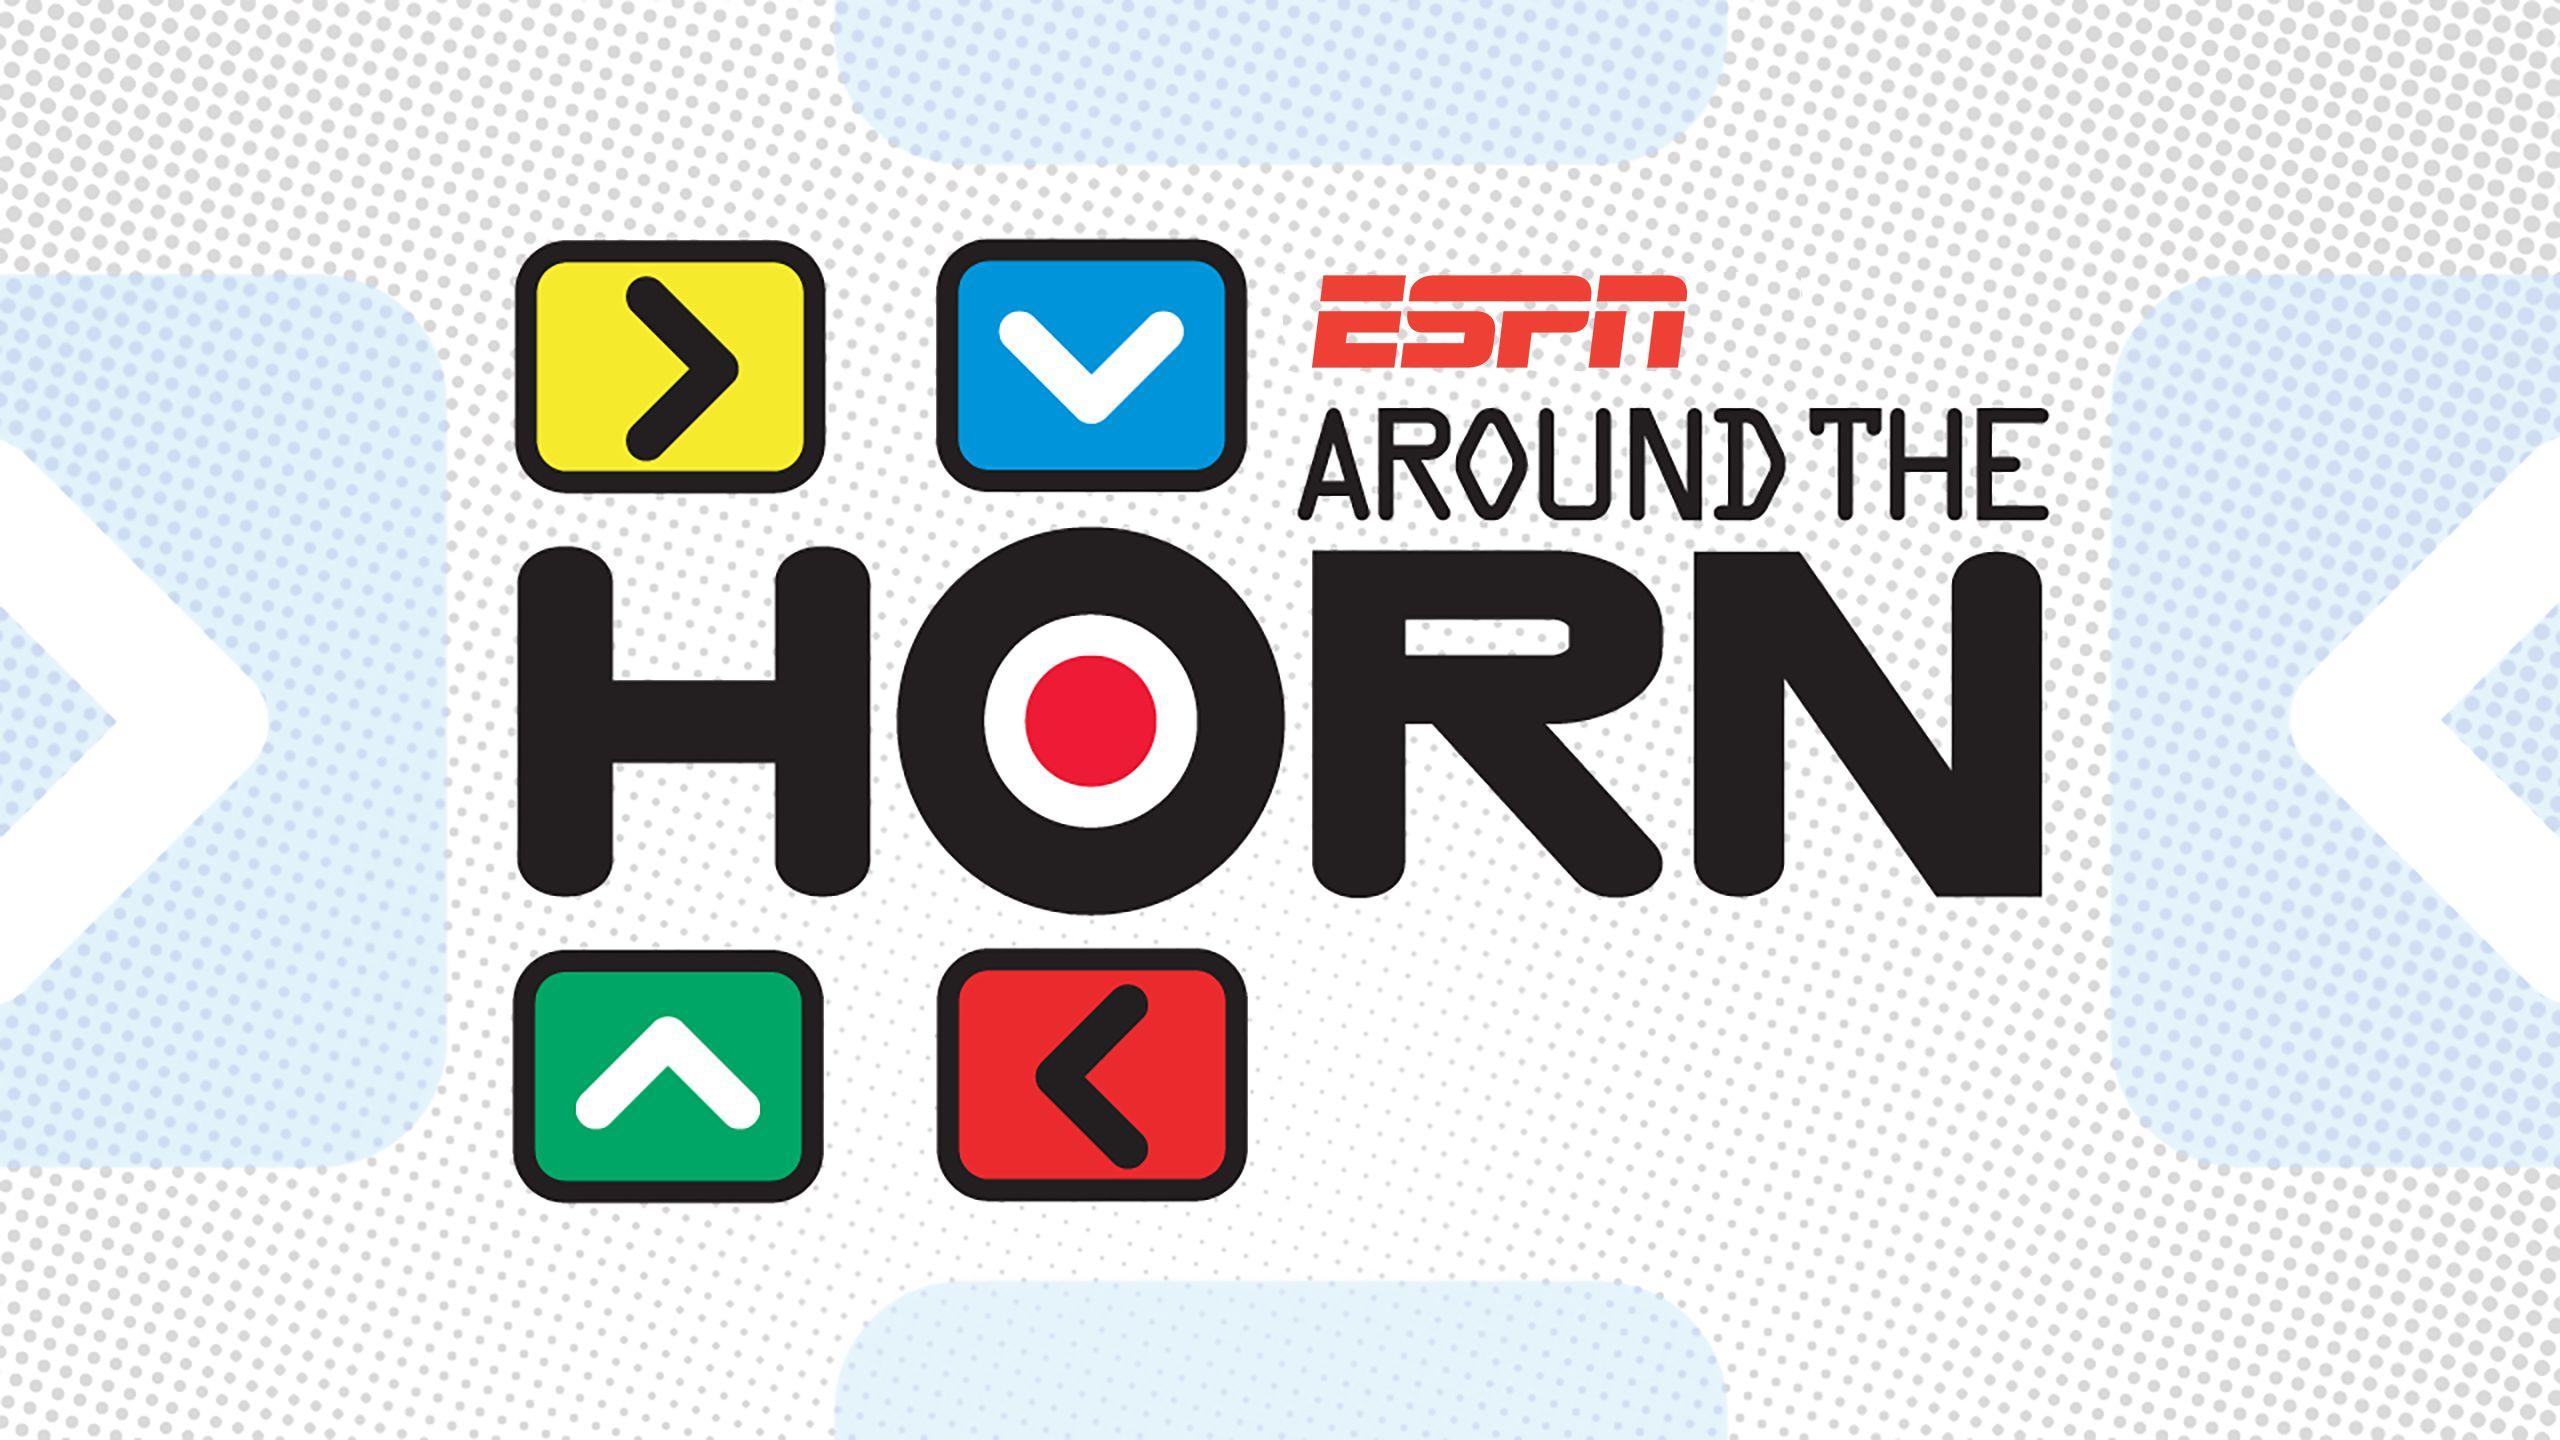 Thu, 10/5 - Around The Horn